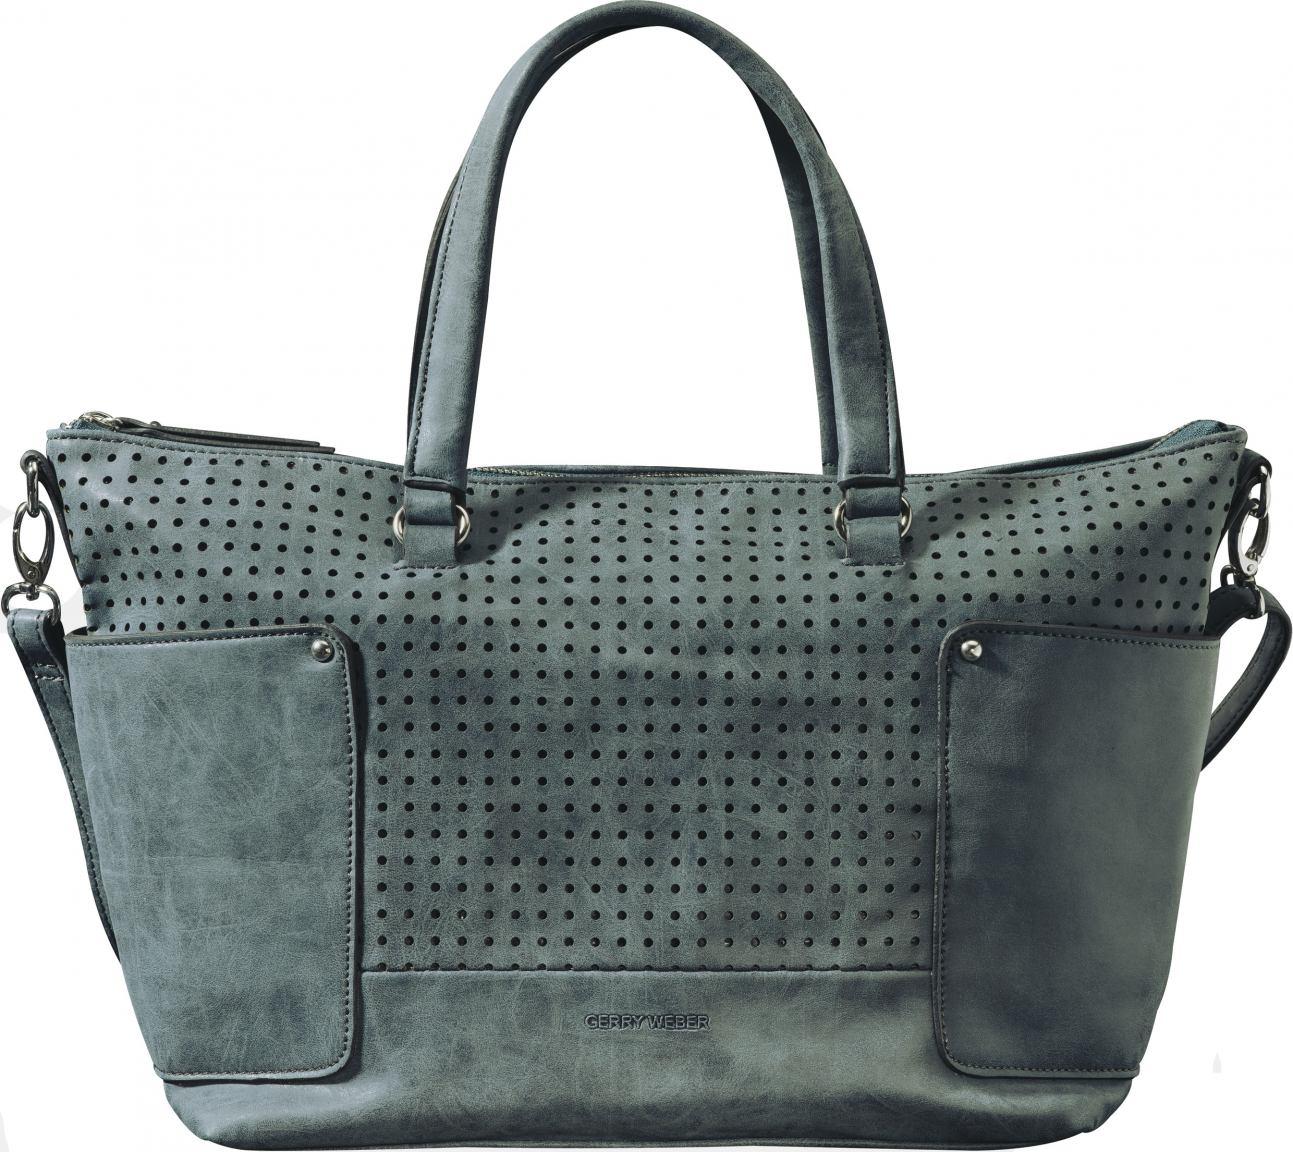 gerry weber handtasche m street spirit dark blue bags more. Black Bedroom Furniture Sets. Home Design Ideas